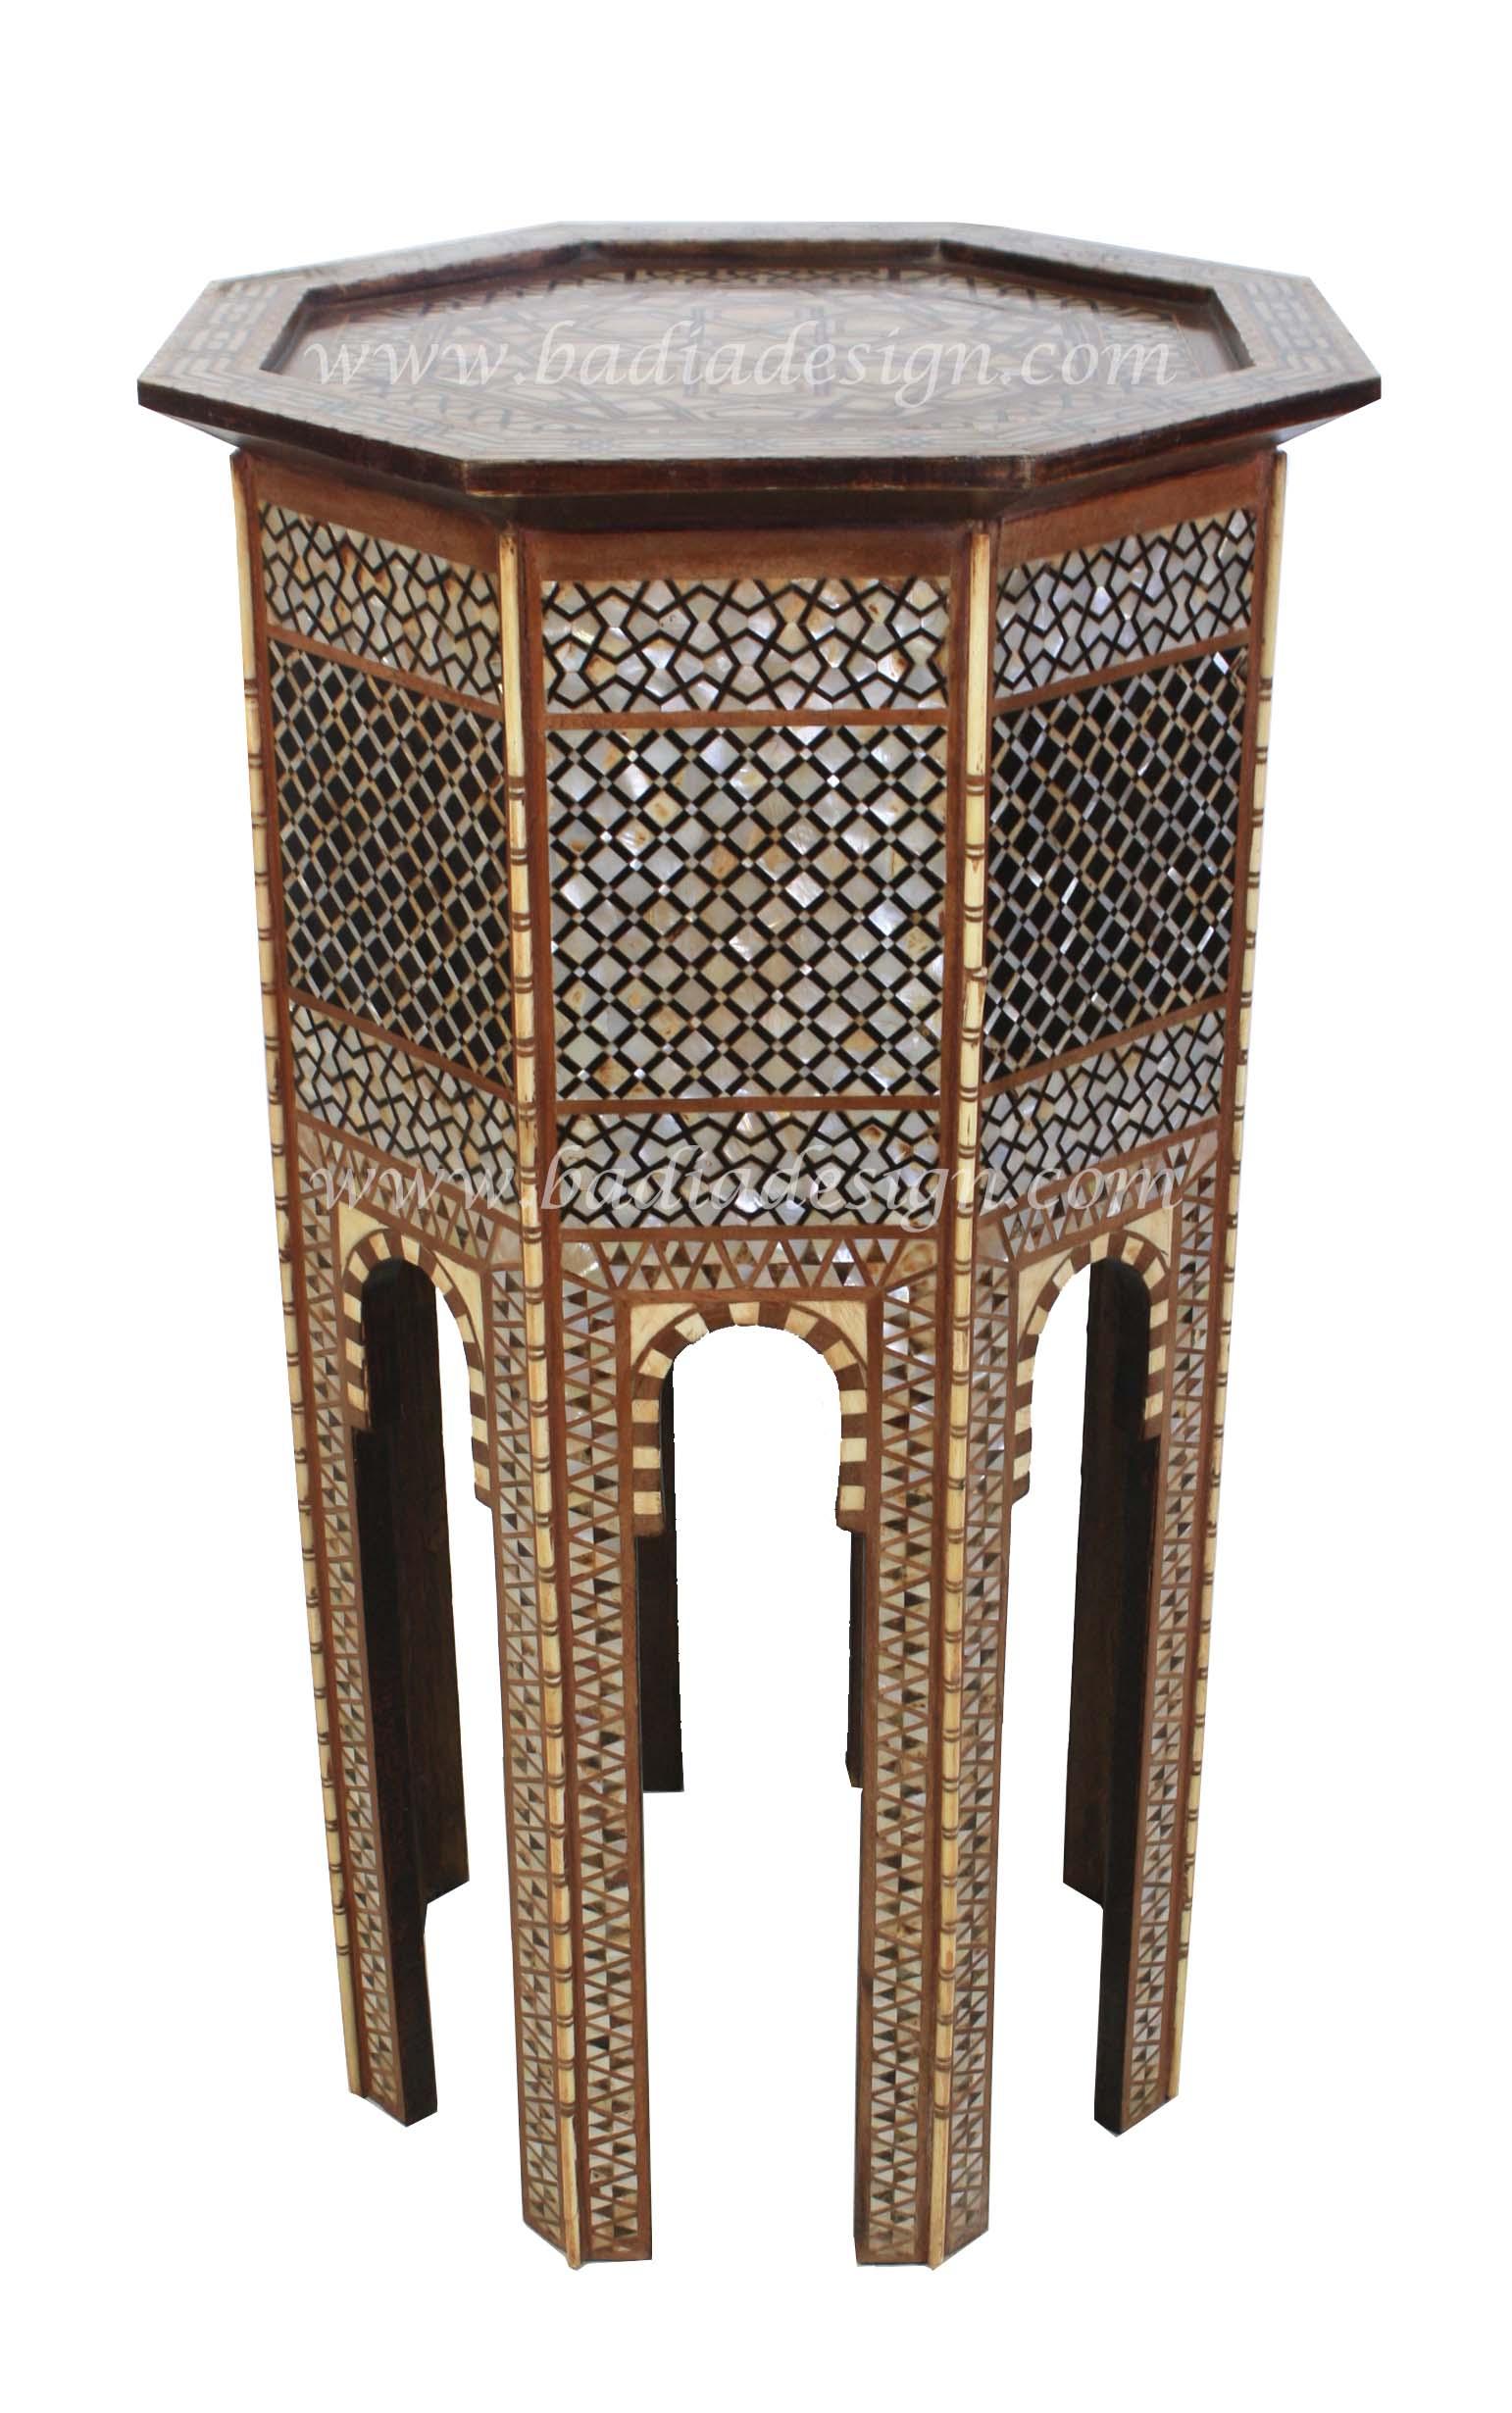 syrian-design-furniture-new-york-mop-st064-1.jpg